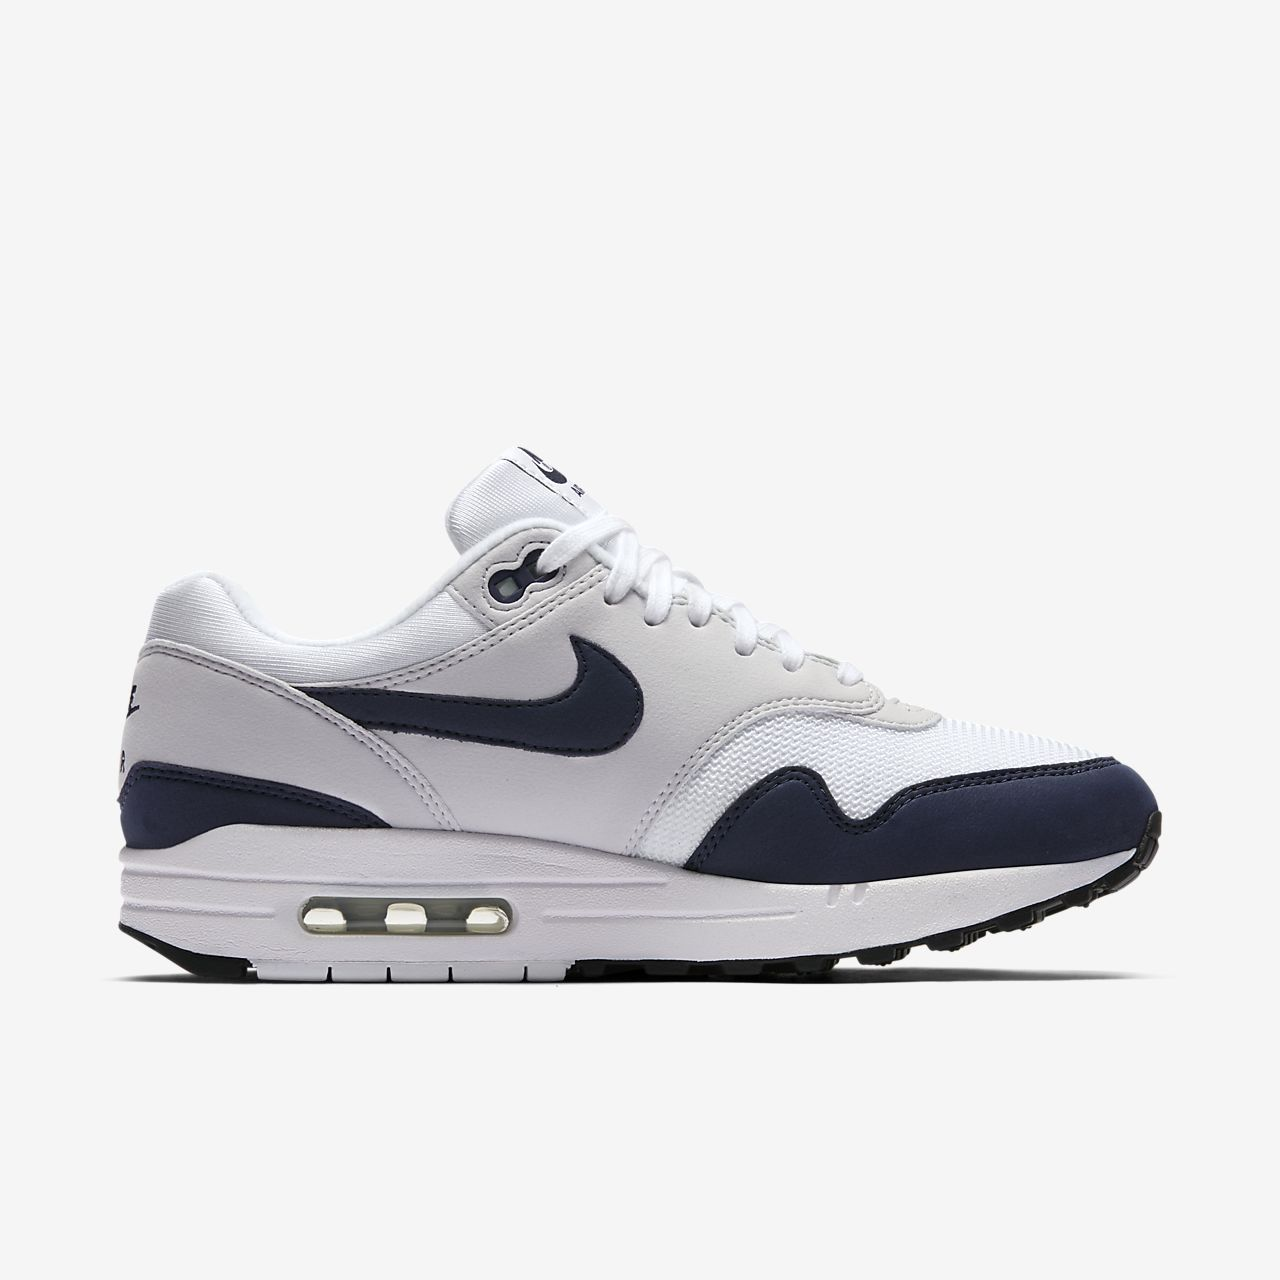 womens nike air max 1 se running shoes